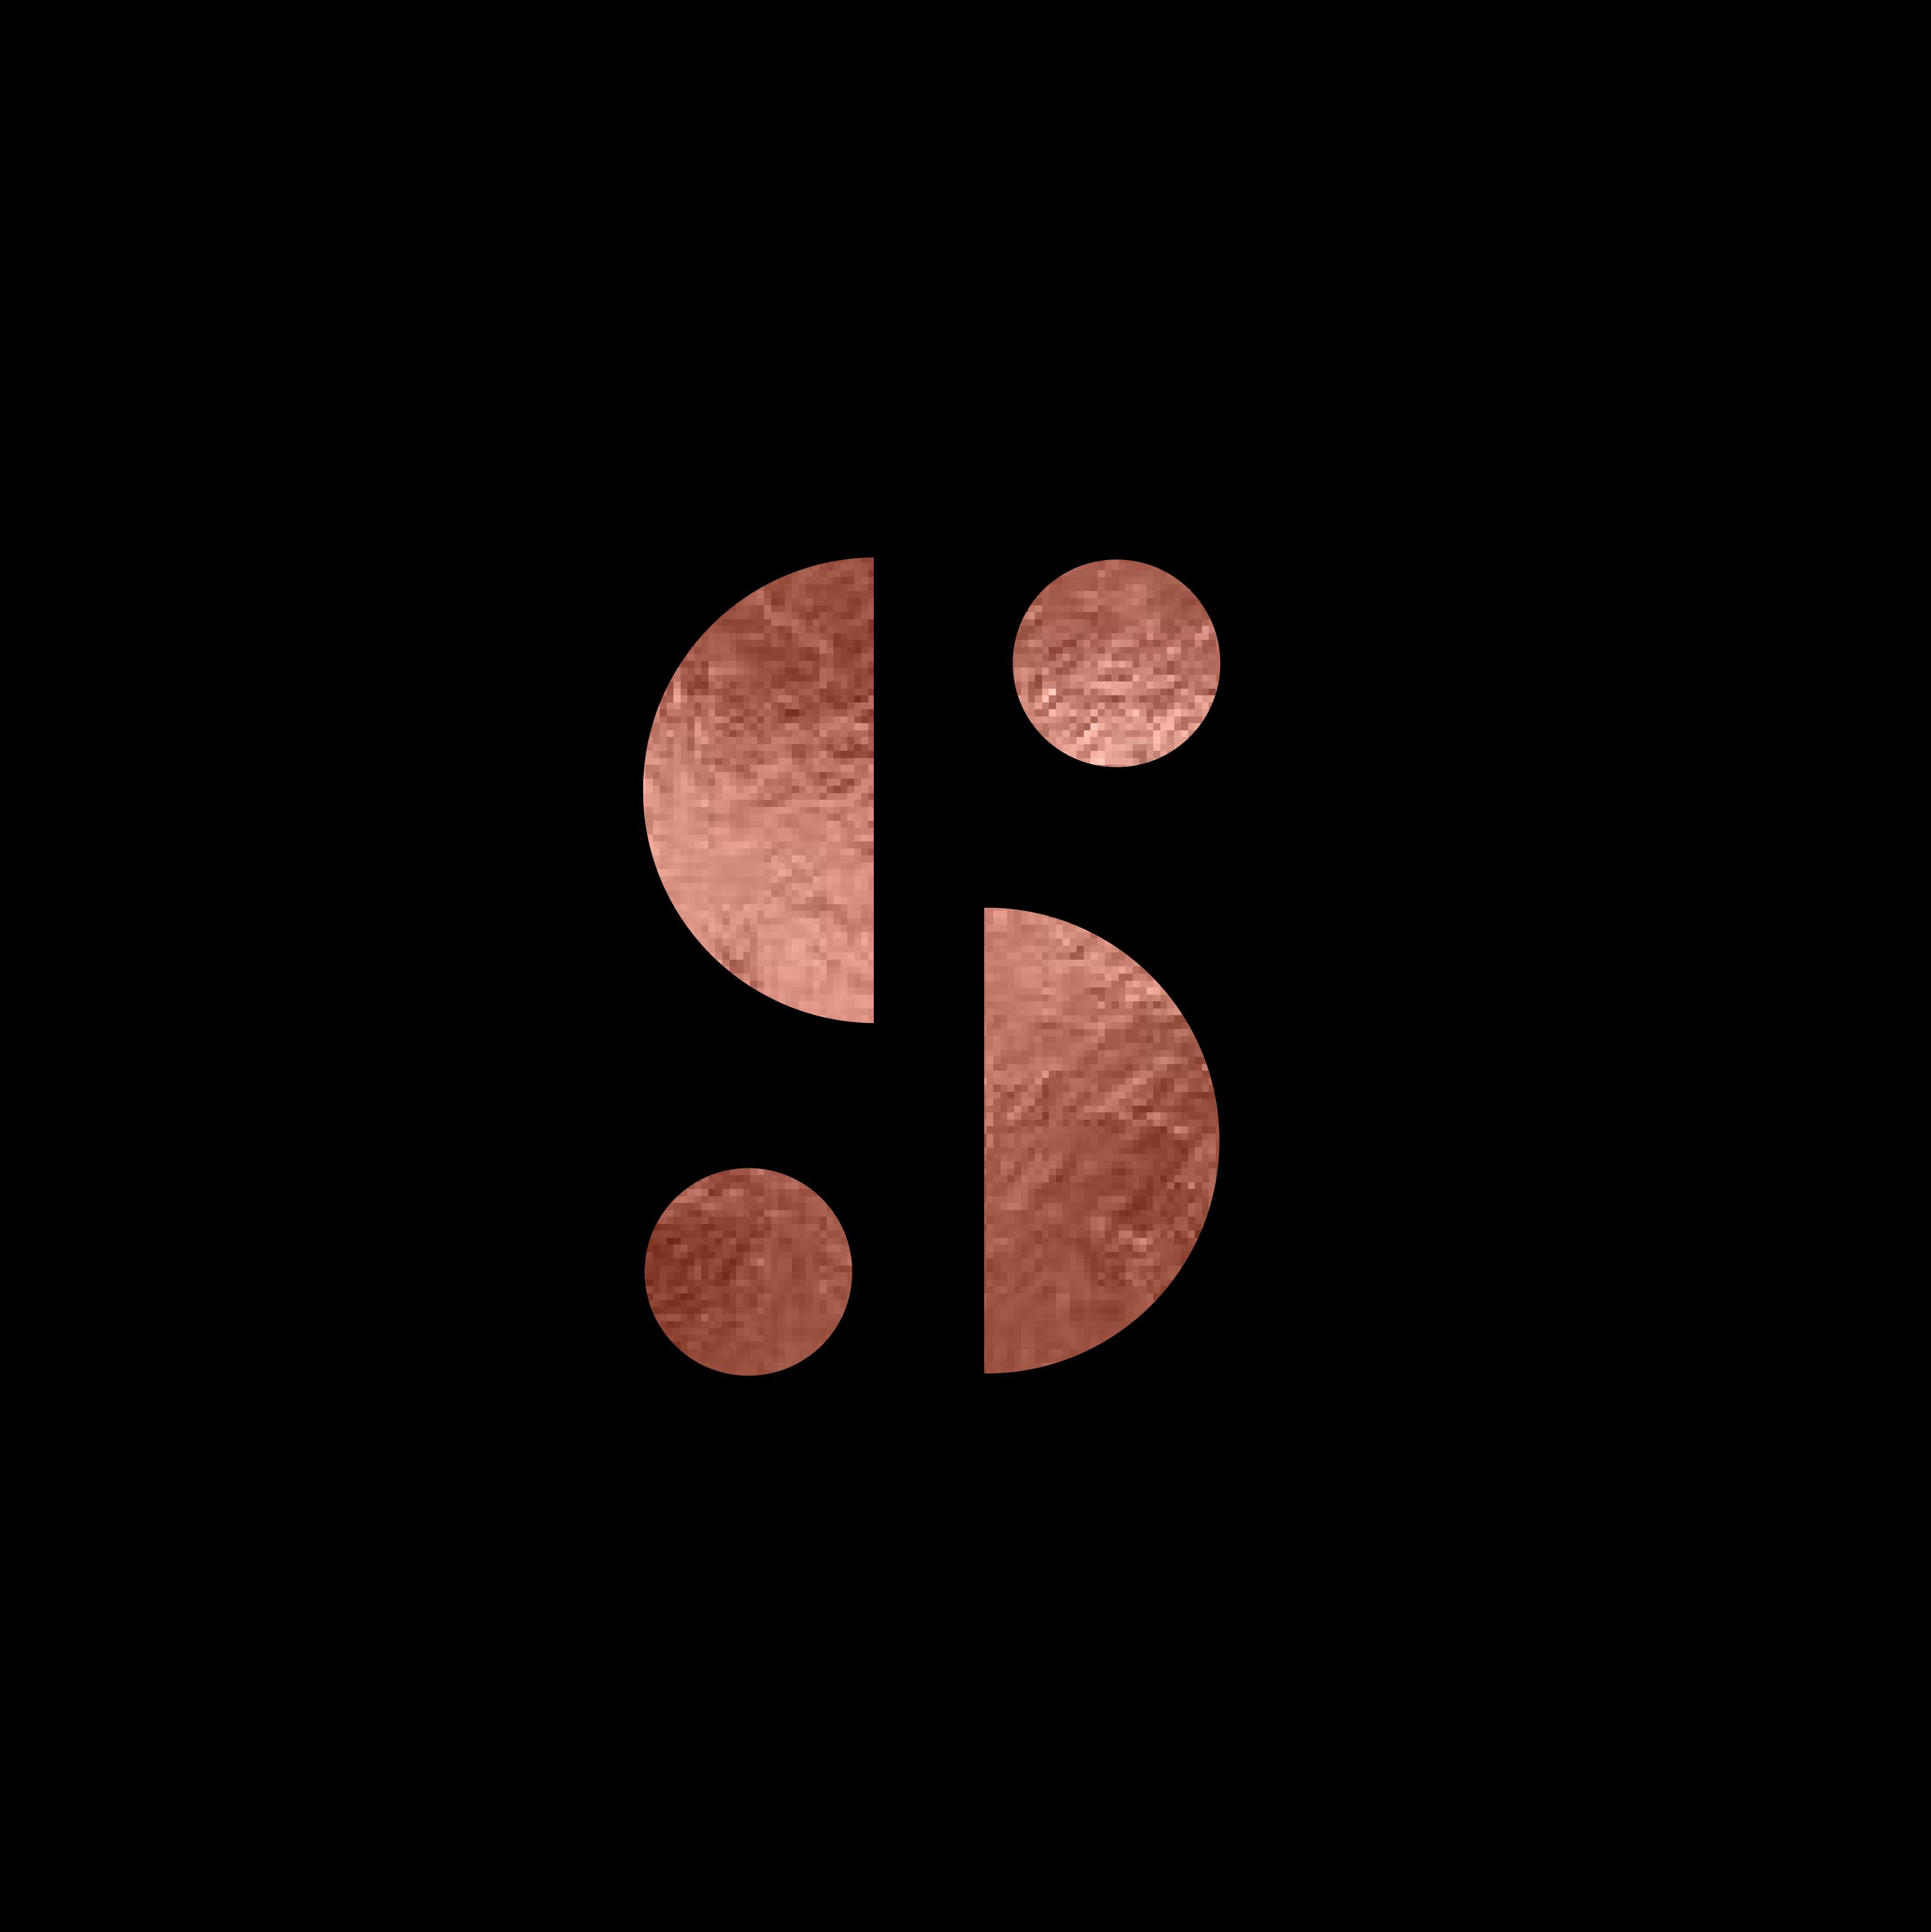 Studio London Co Logo - S Logo Rose Gold Foil with black background